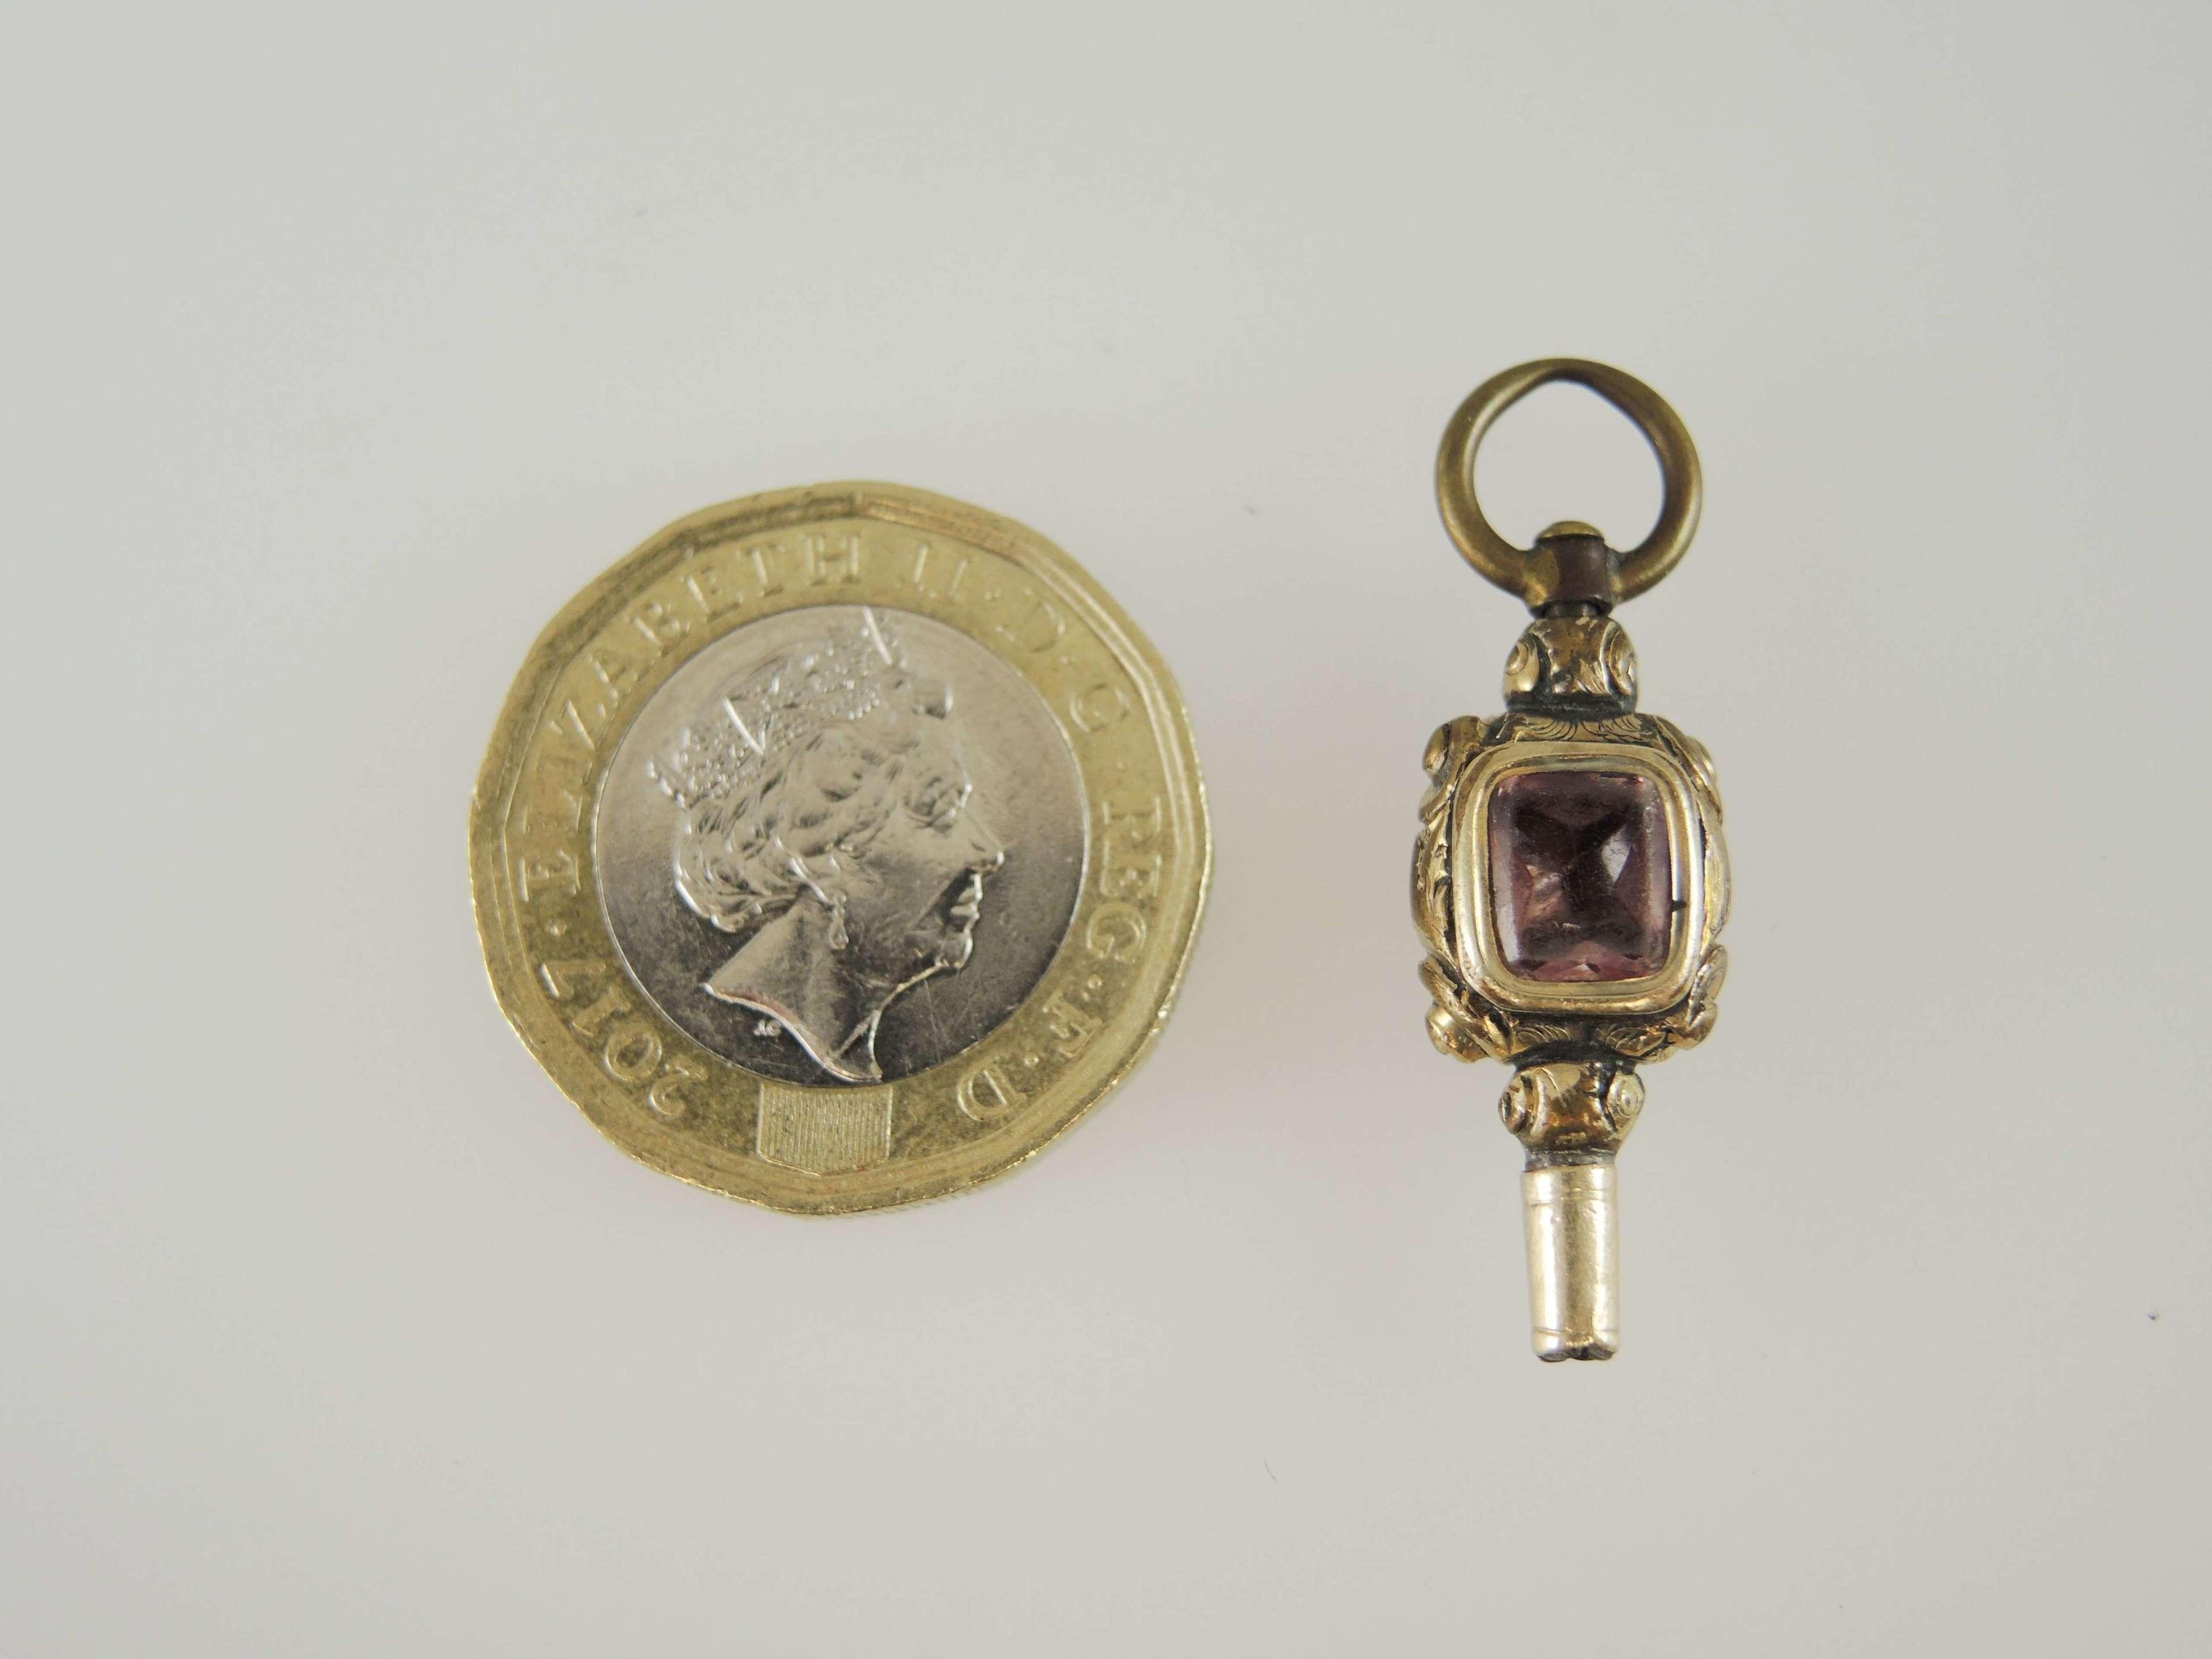 Antique pocket watch key c1880